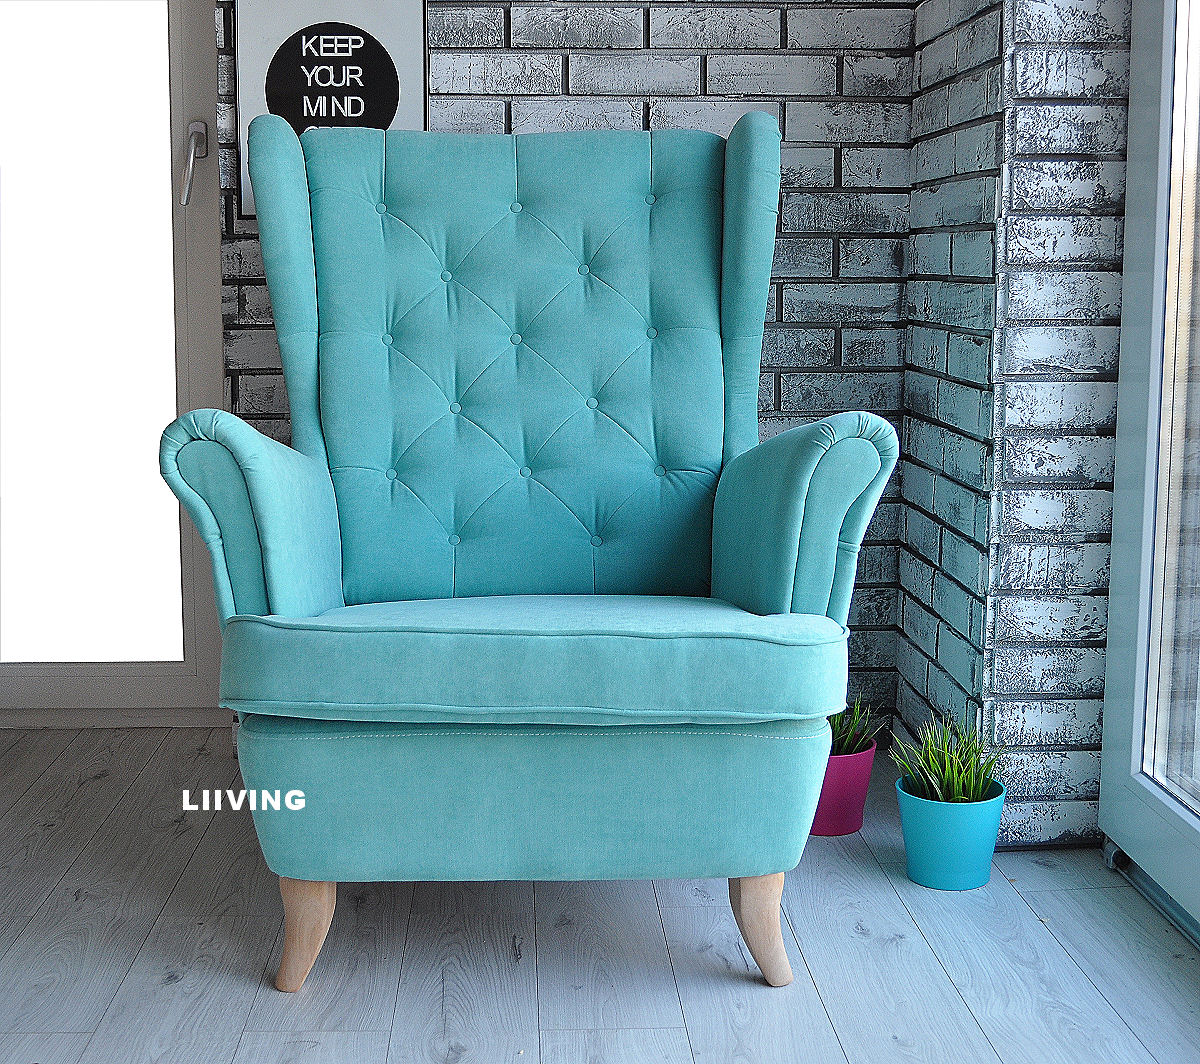 Fotel uszak w kolorze mięty